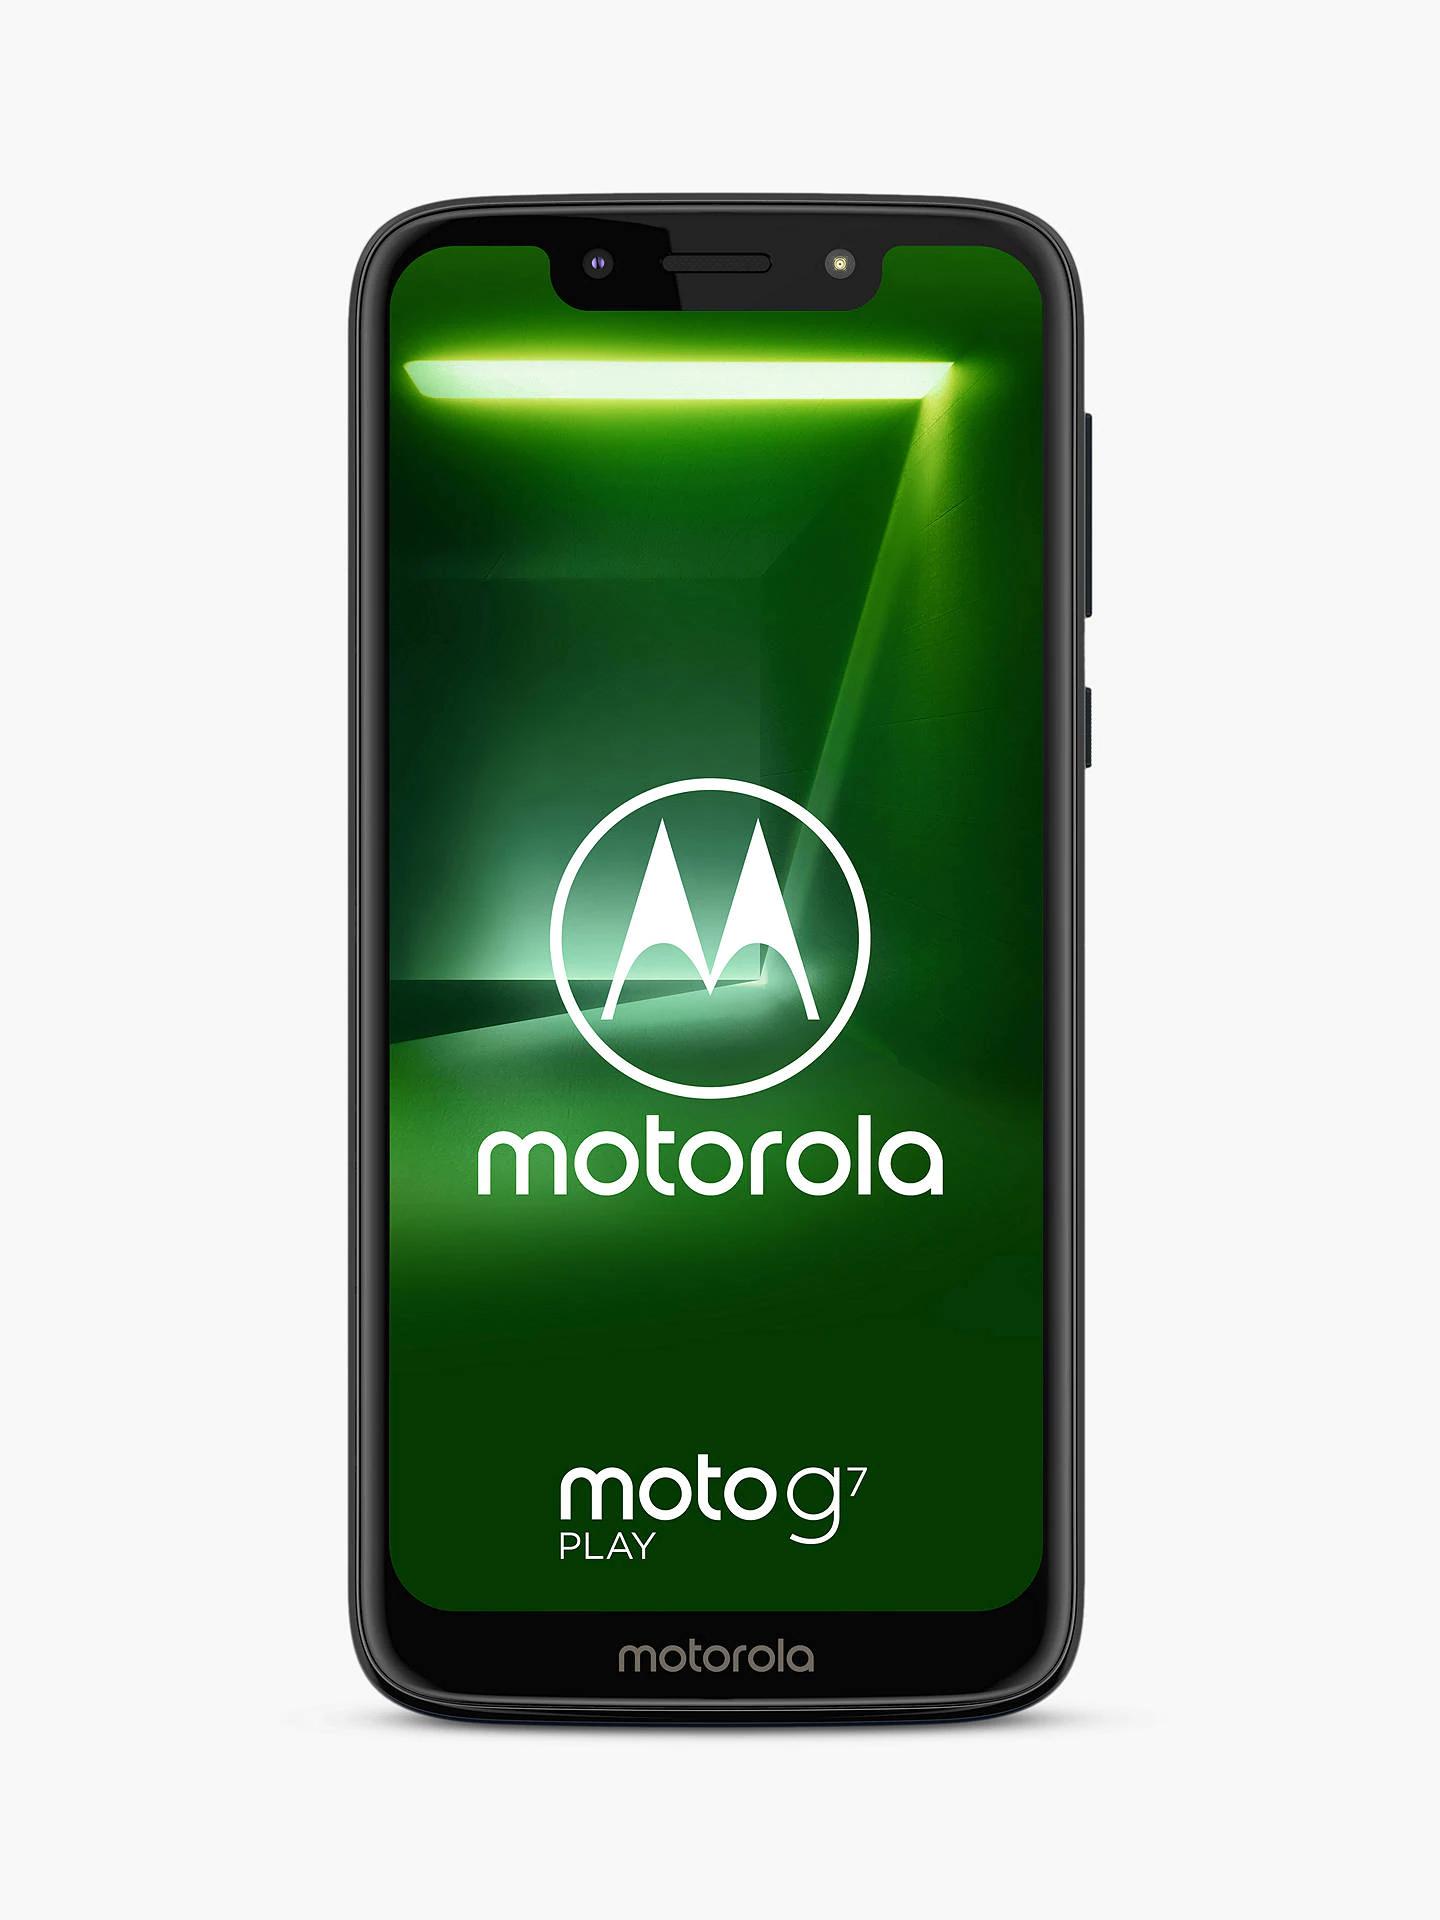 "Motorola g7 Play Dual SIM Free Smartphone, Android, 5.7"", 4G LTE, SIM Free, 32GB, Indigo - £105 delivered @ John Lewis & Partners"